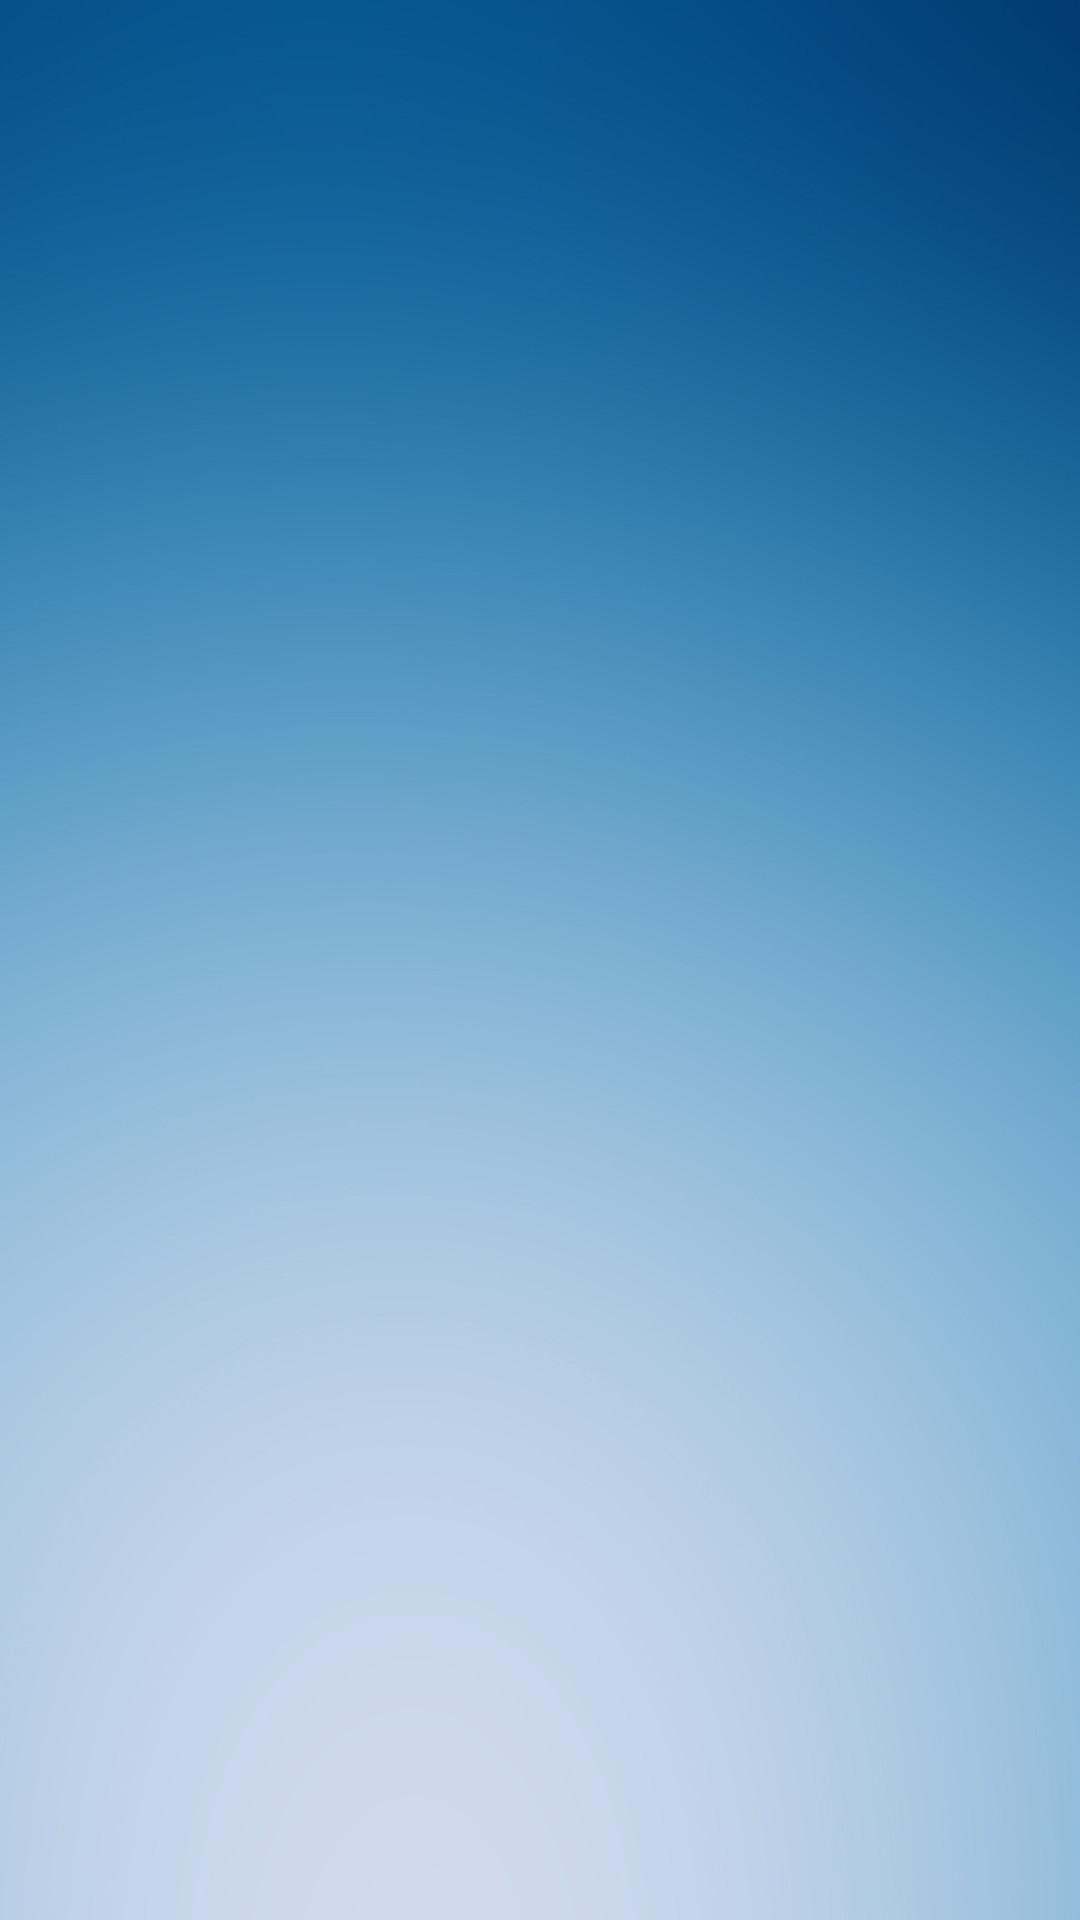 … Blue Grey Wallpaper iPhone 6 Plus by DeviantSith17